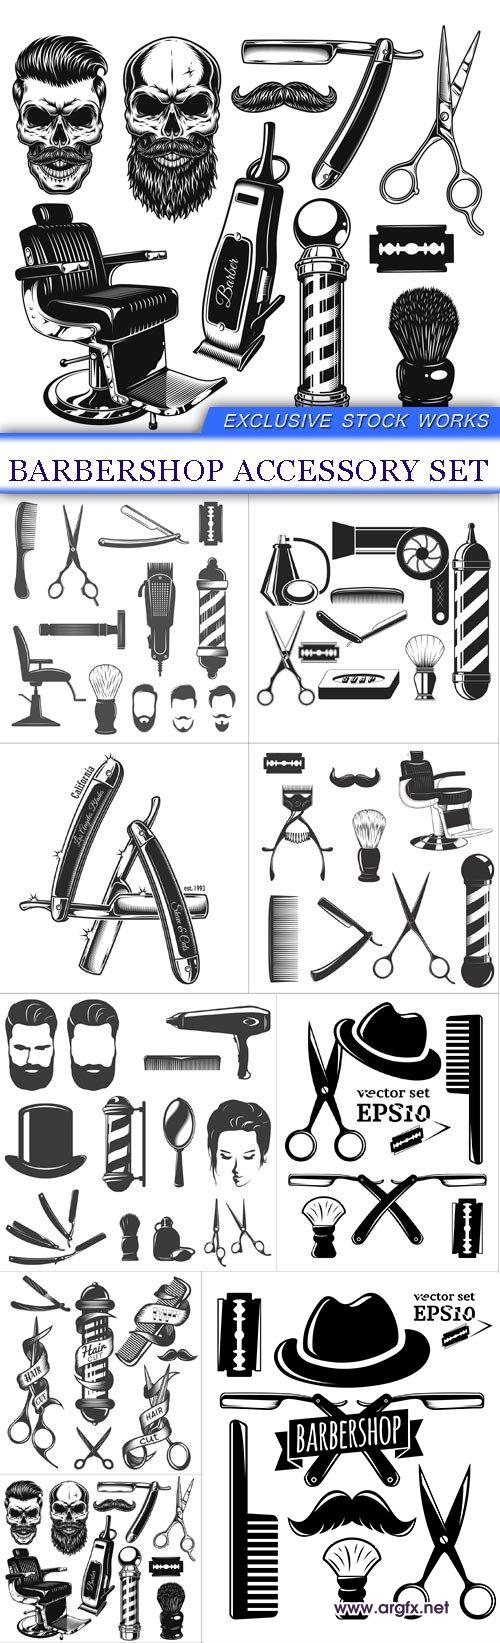 Barbershop accessory set 9X EPS